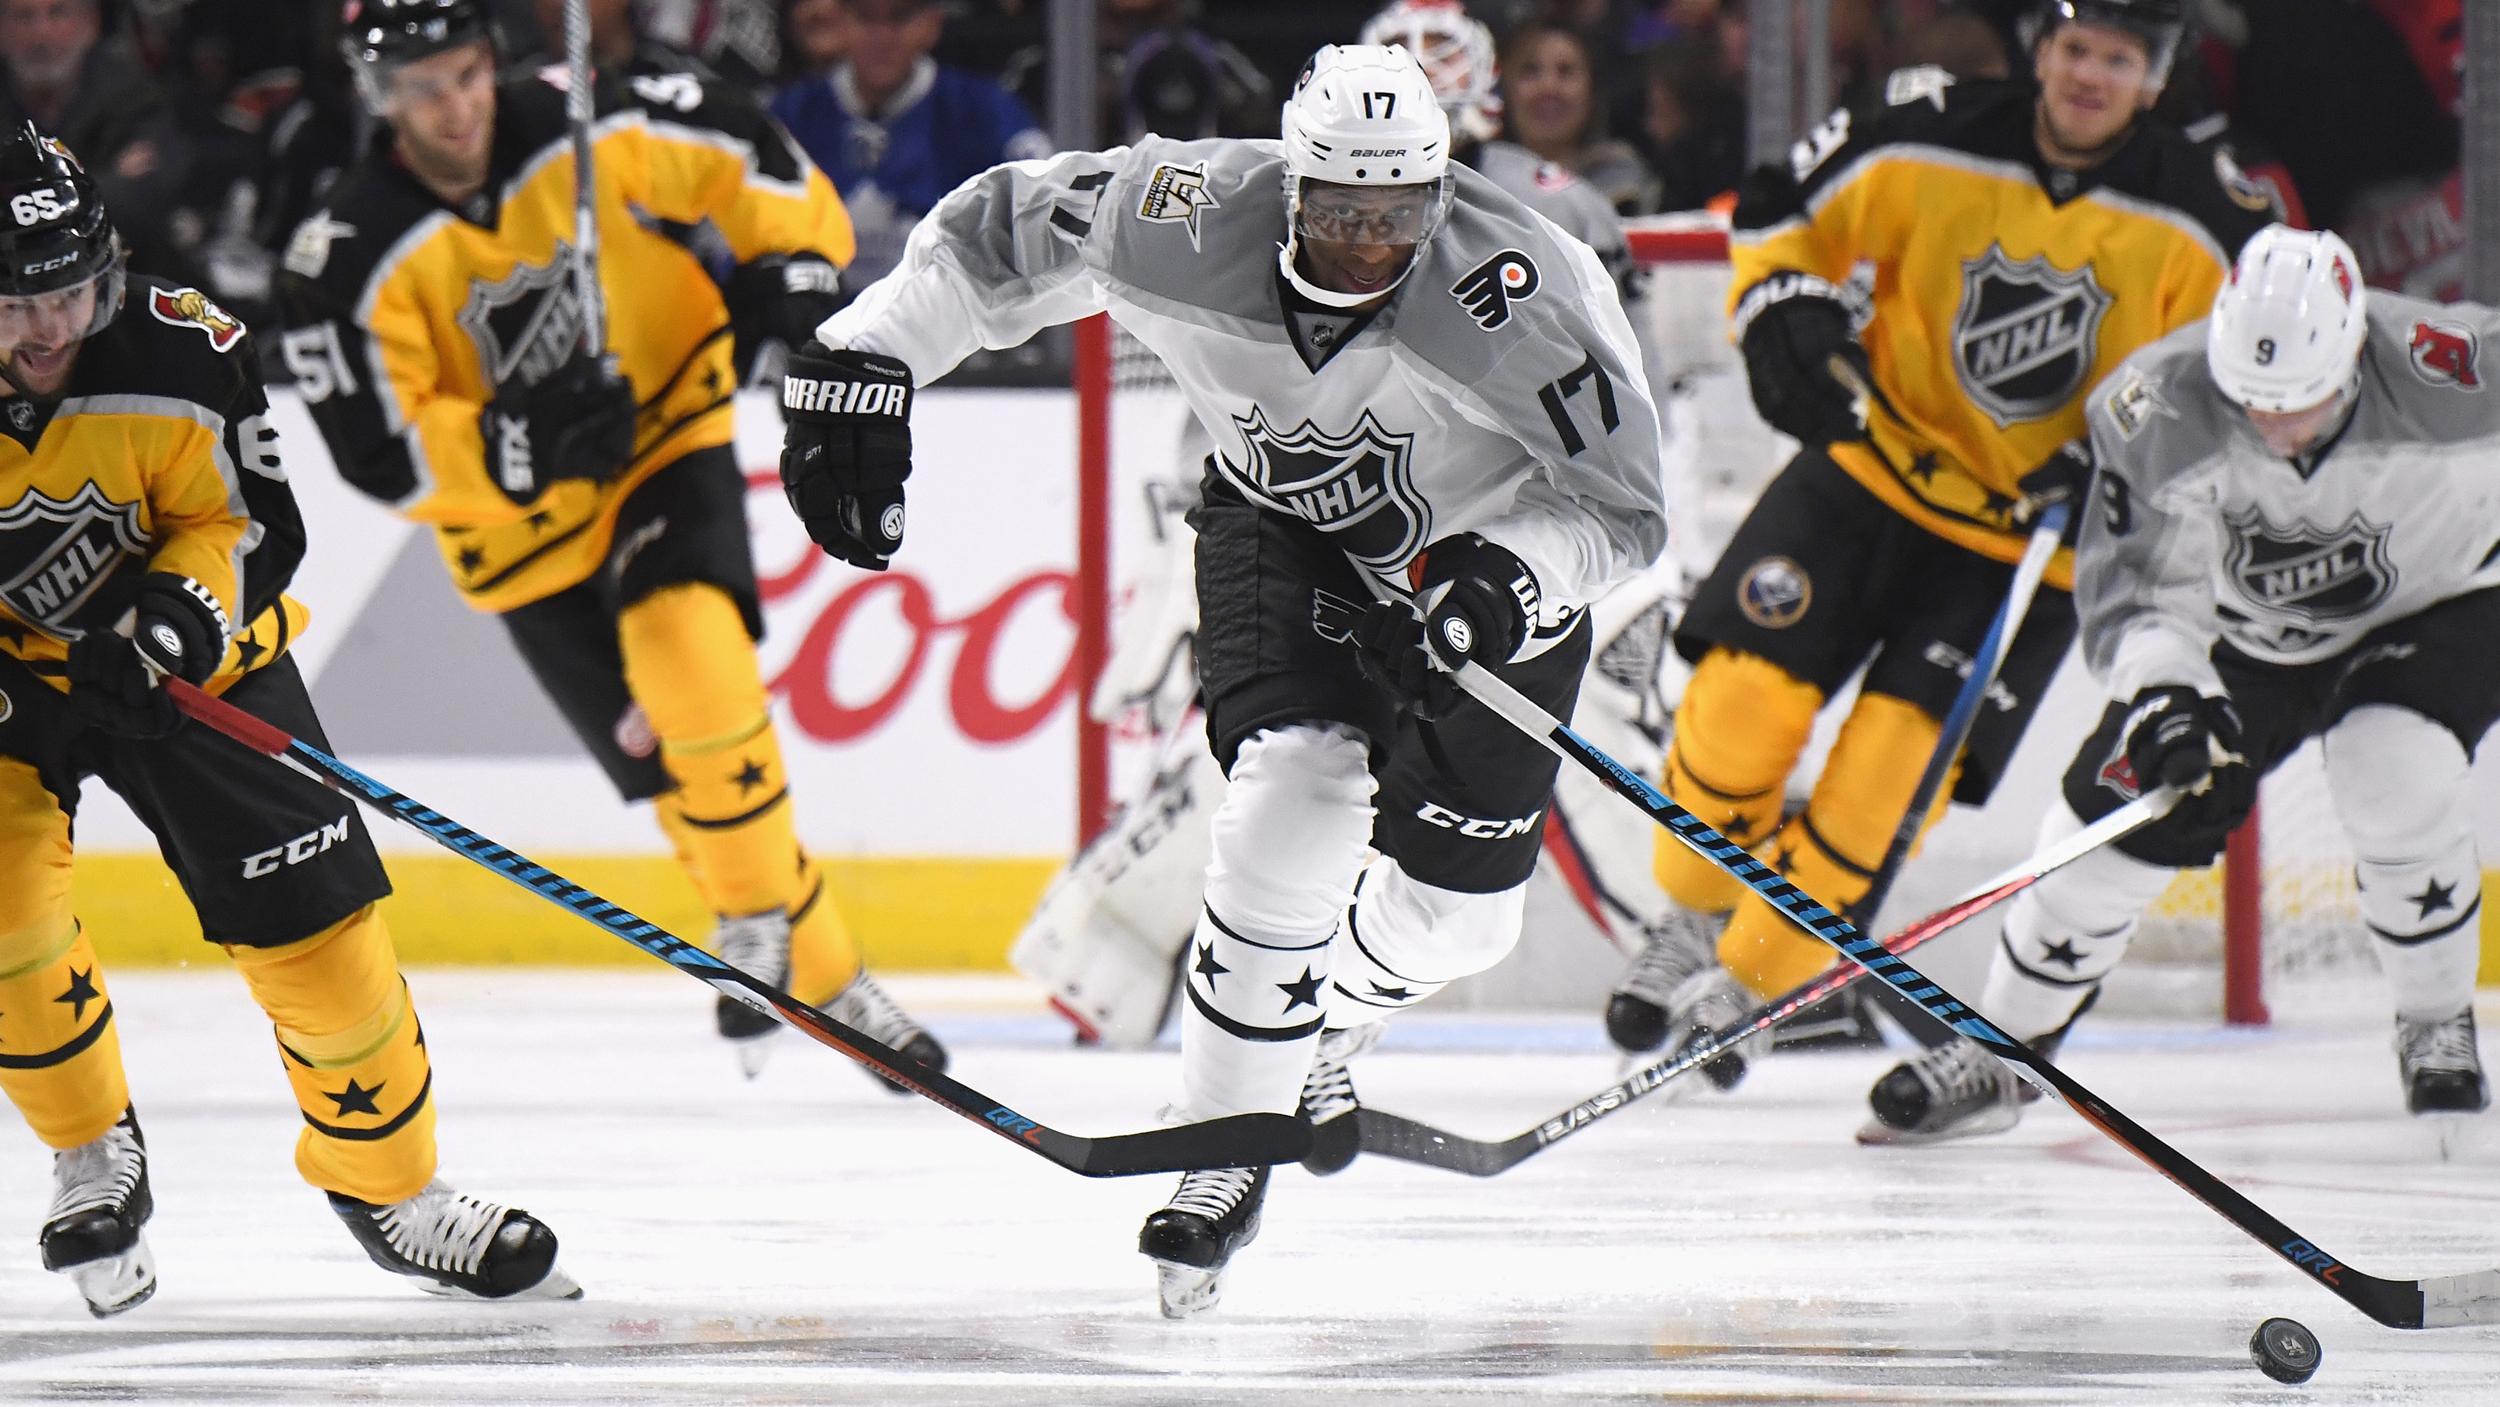 2017 Honda NHL All-Star Game – Metropolitan Division v Atlantic Division